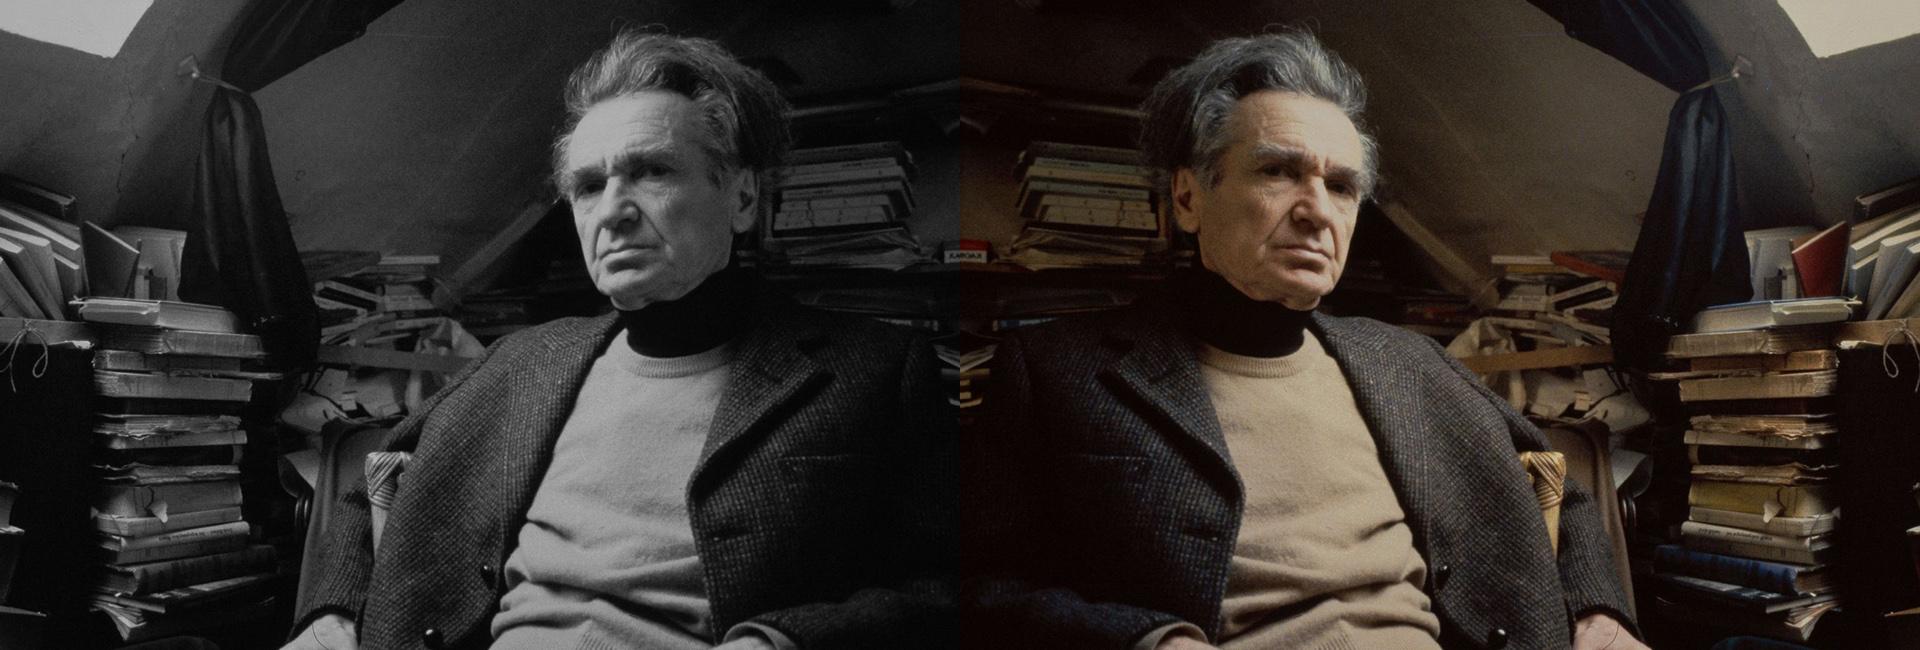 Emil Cioran filosof român filosofia moarte slider